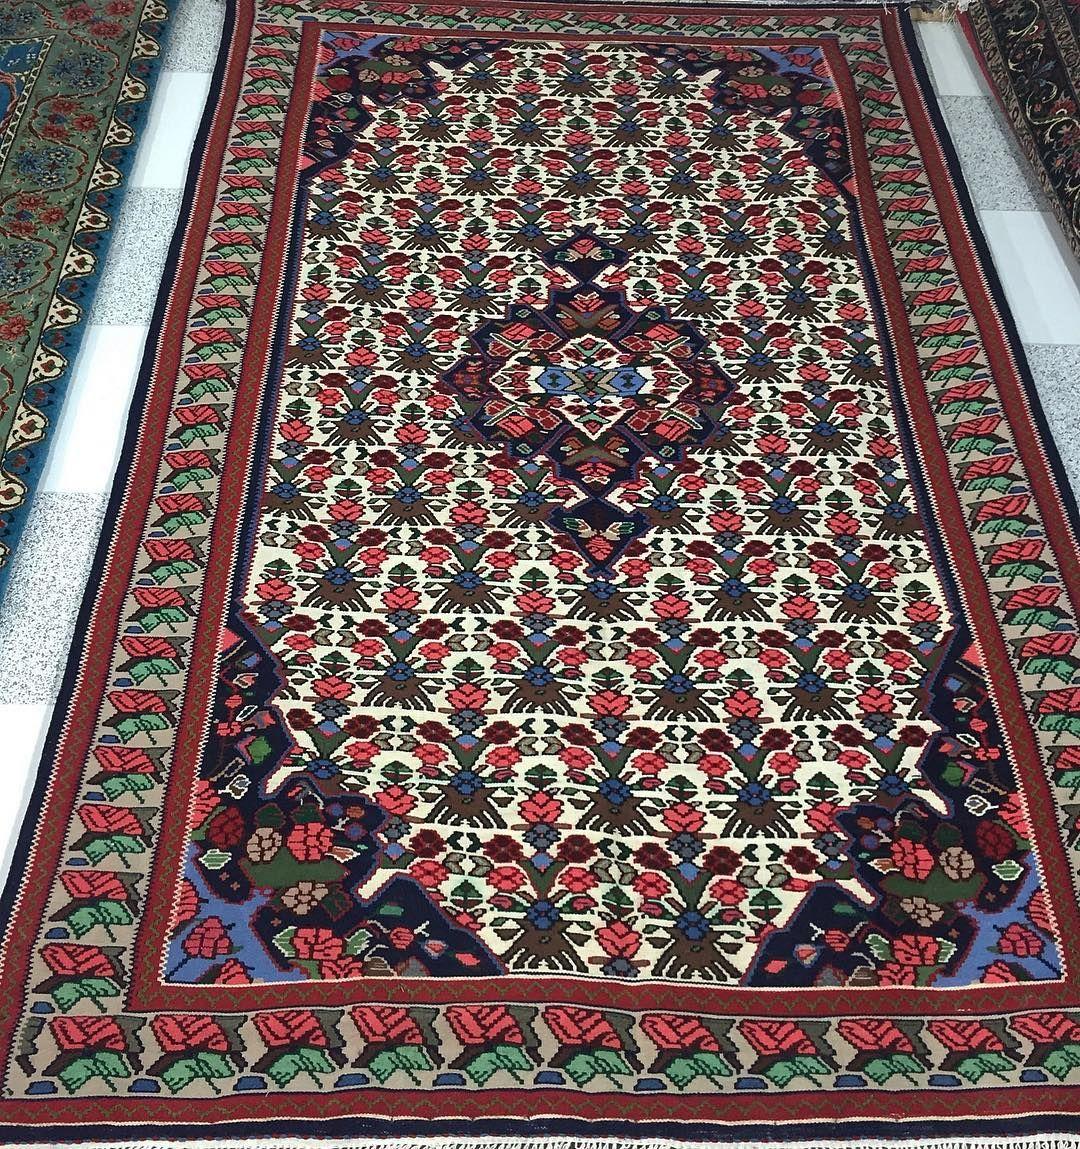 Silk Carpet World Carpet World Carpet Stores Silk Carpet